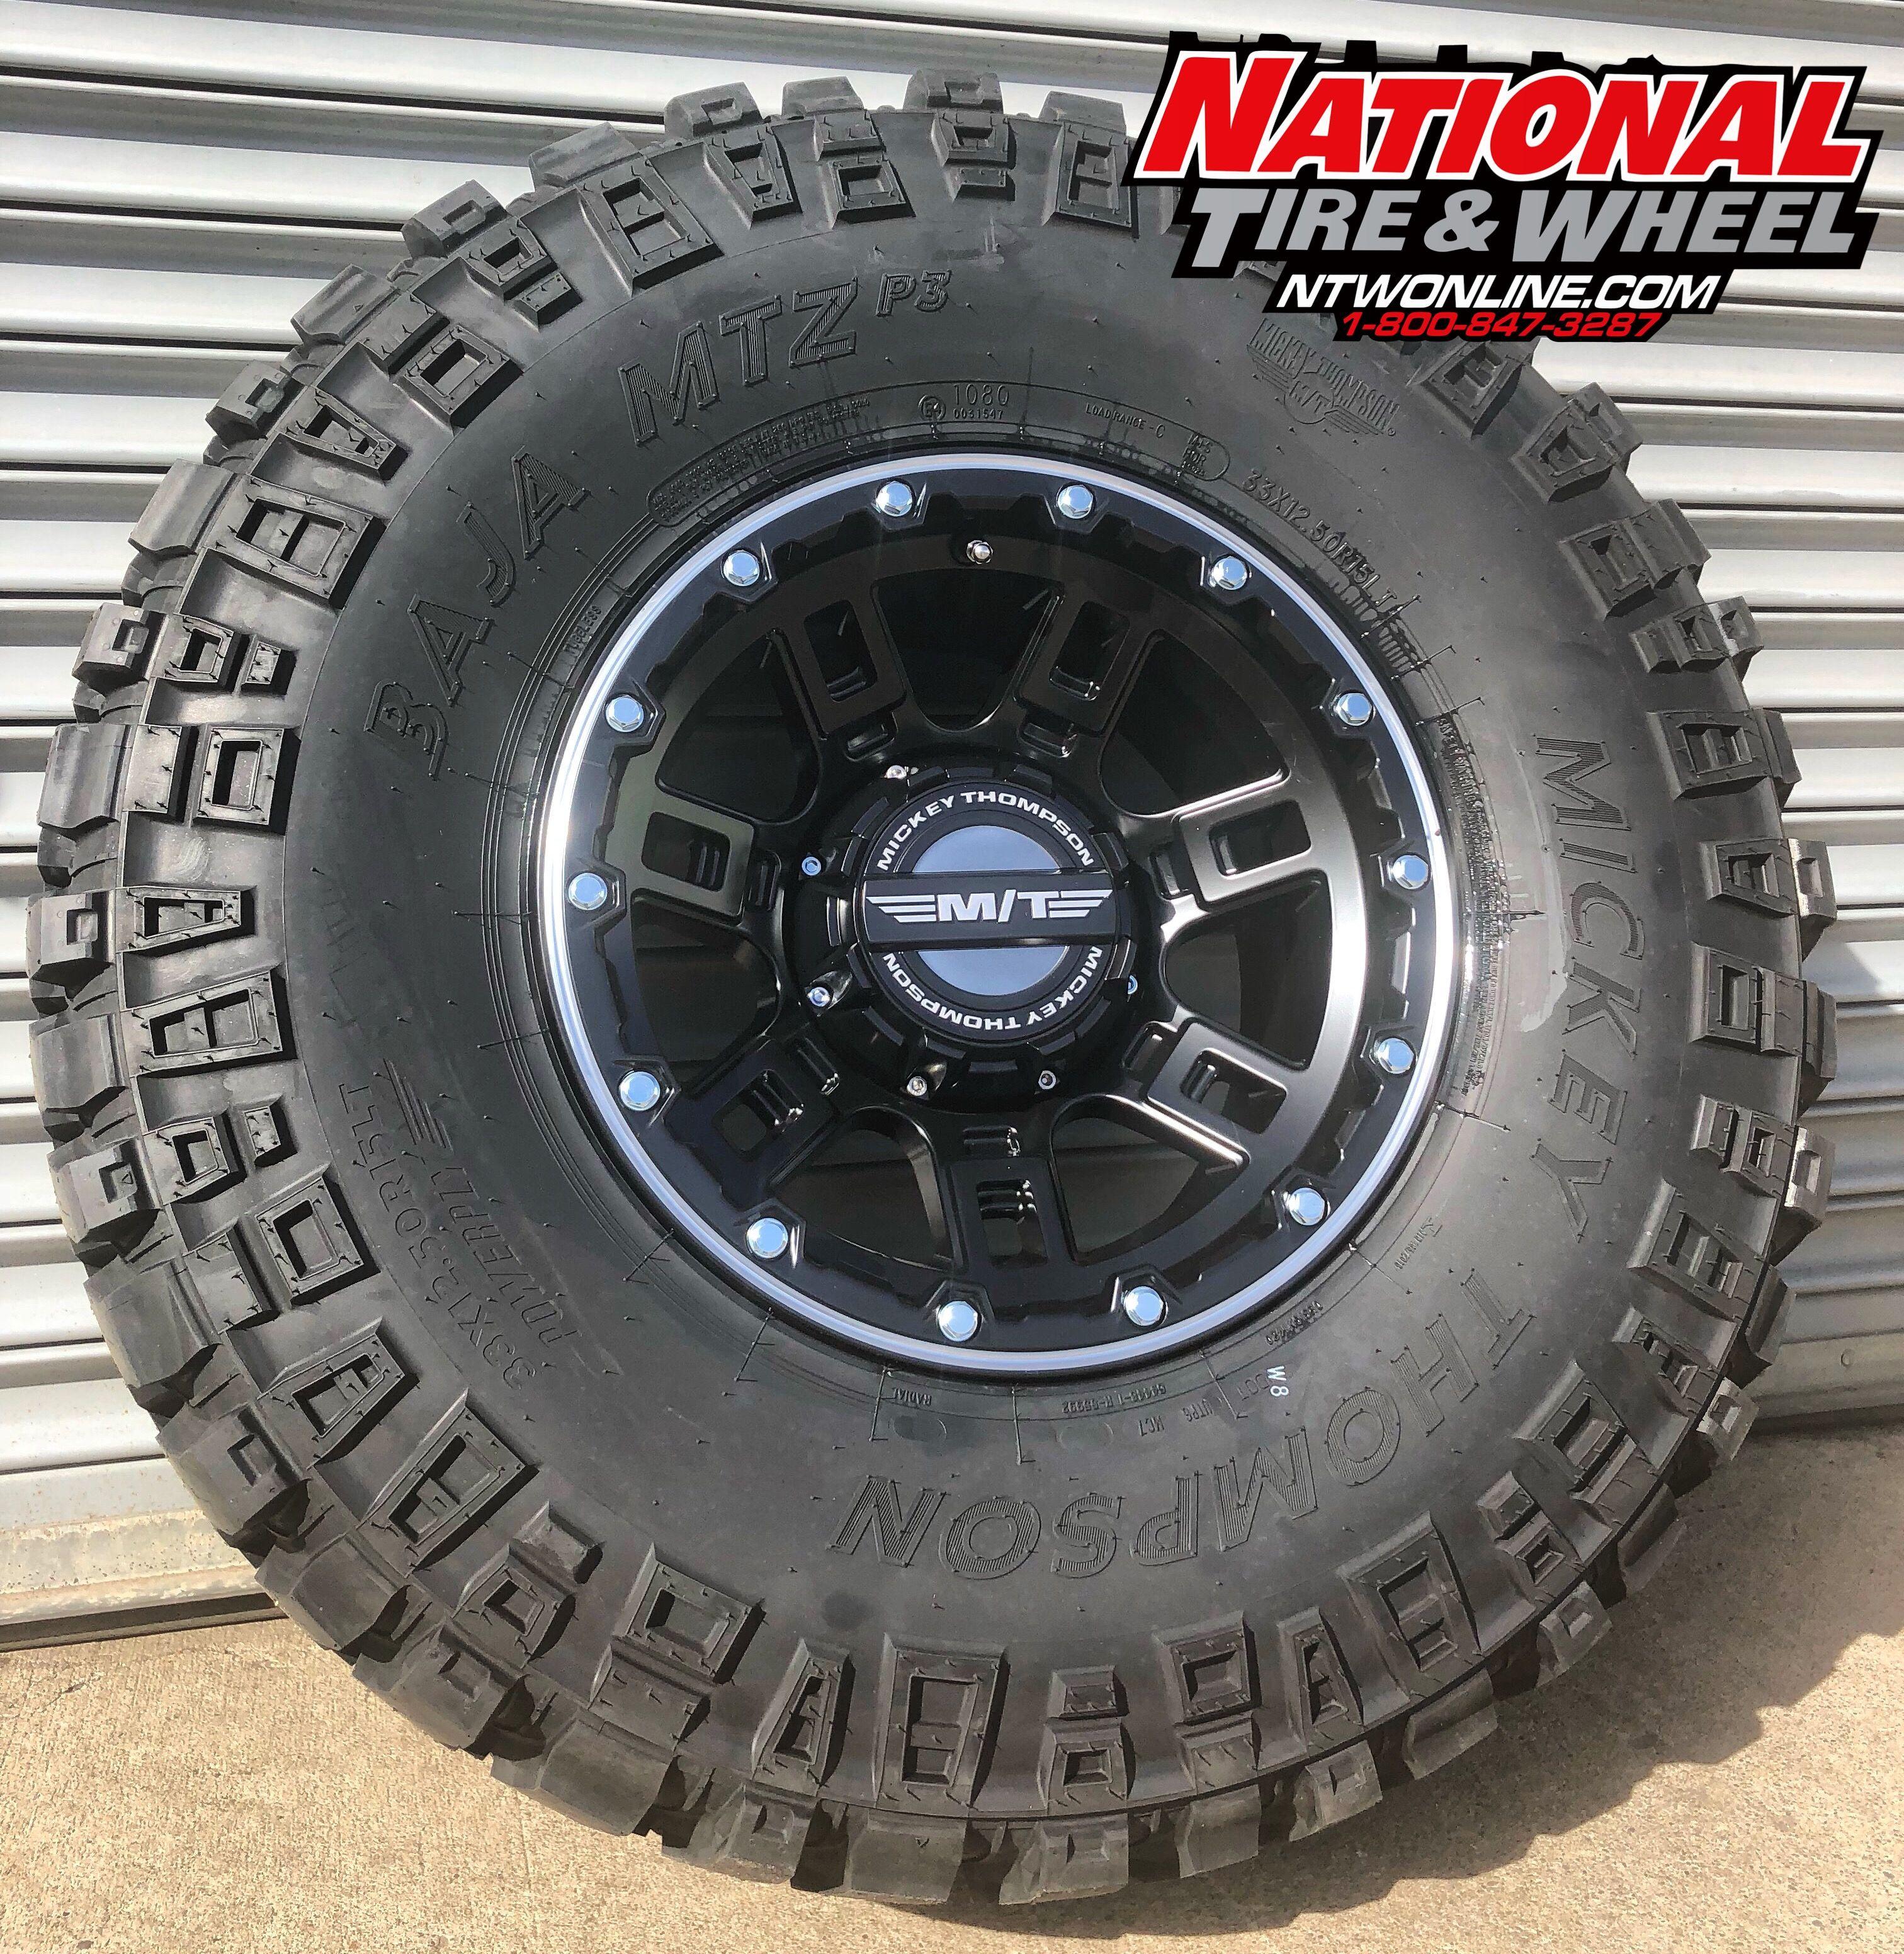 Mickey Thompson Tire & Wheel bo 15X8 Sidebiter Lock mounted up